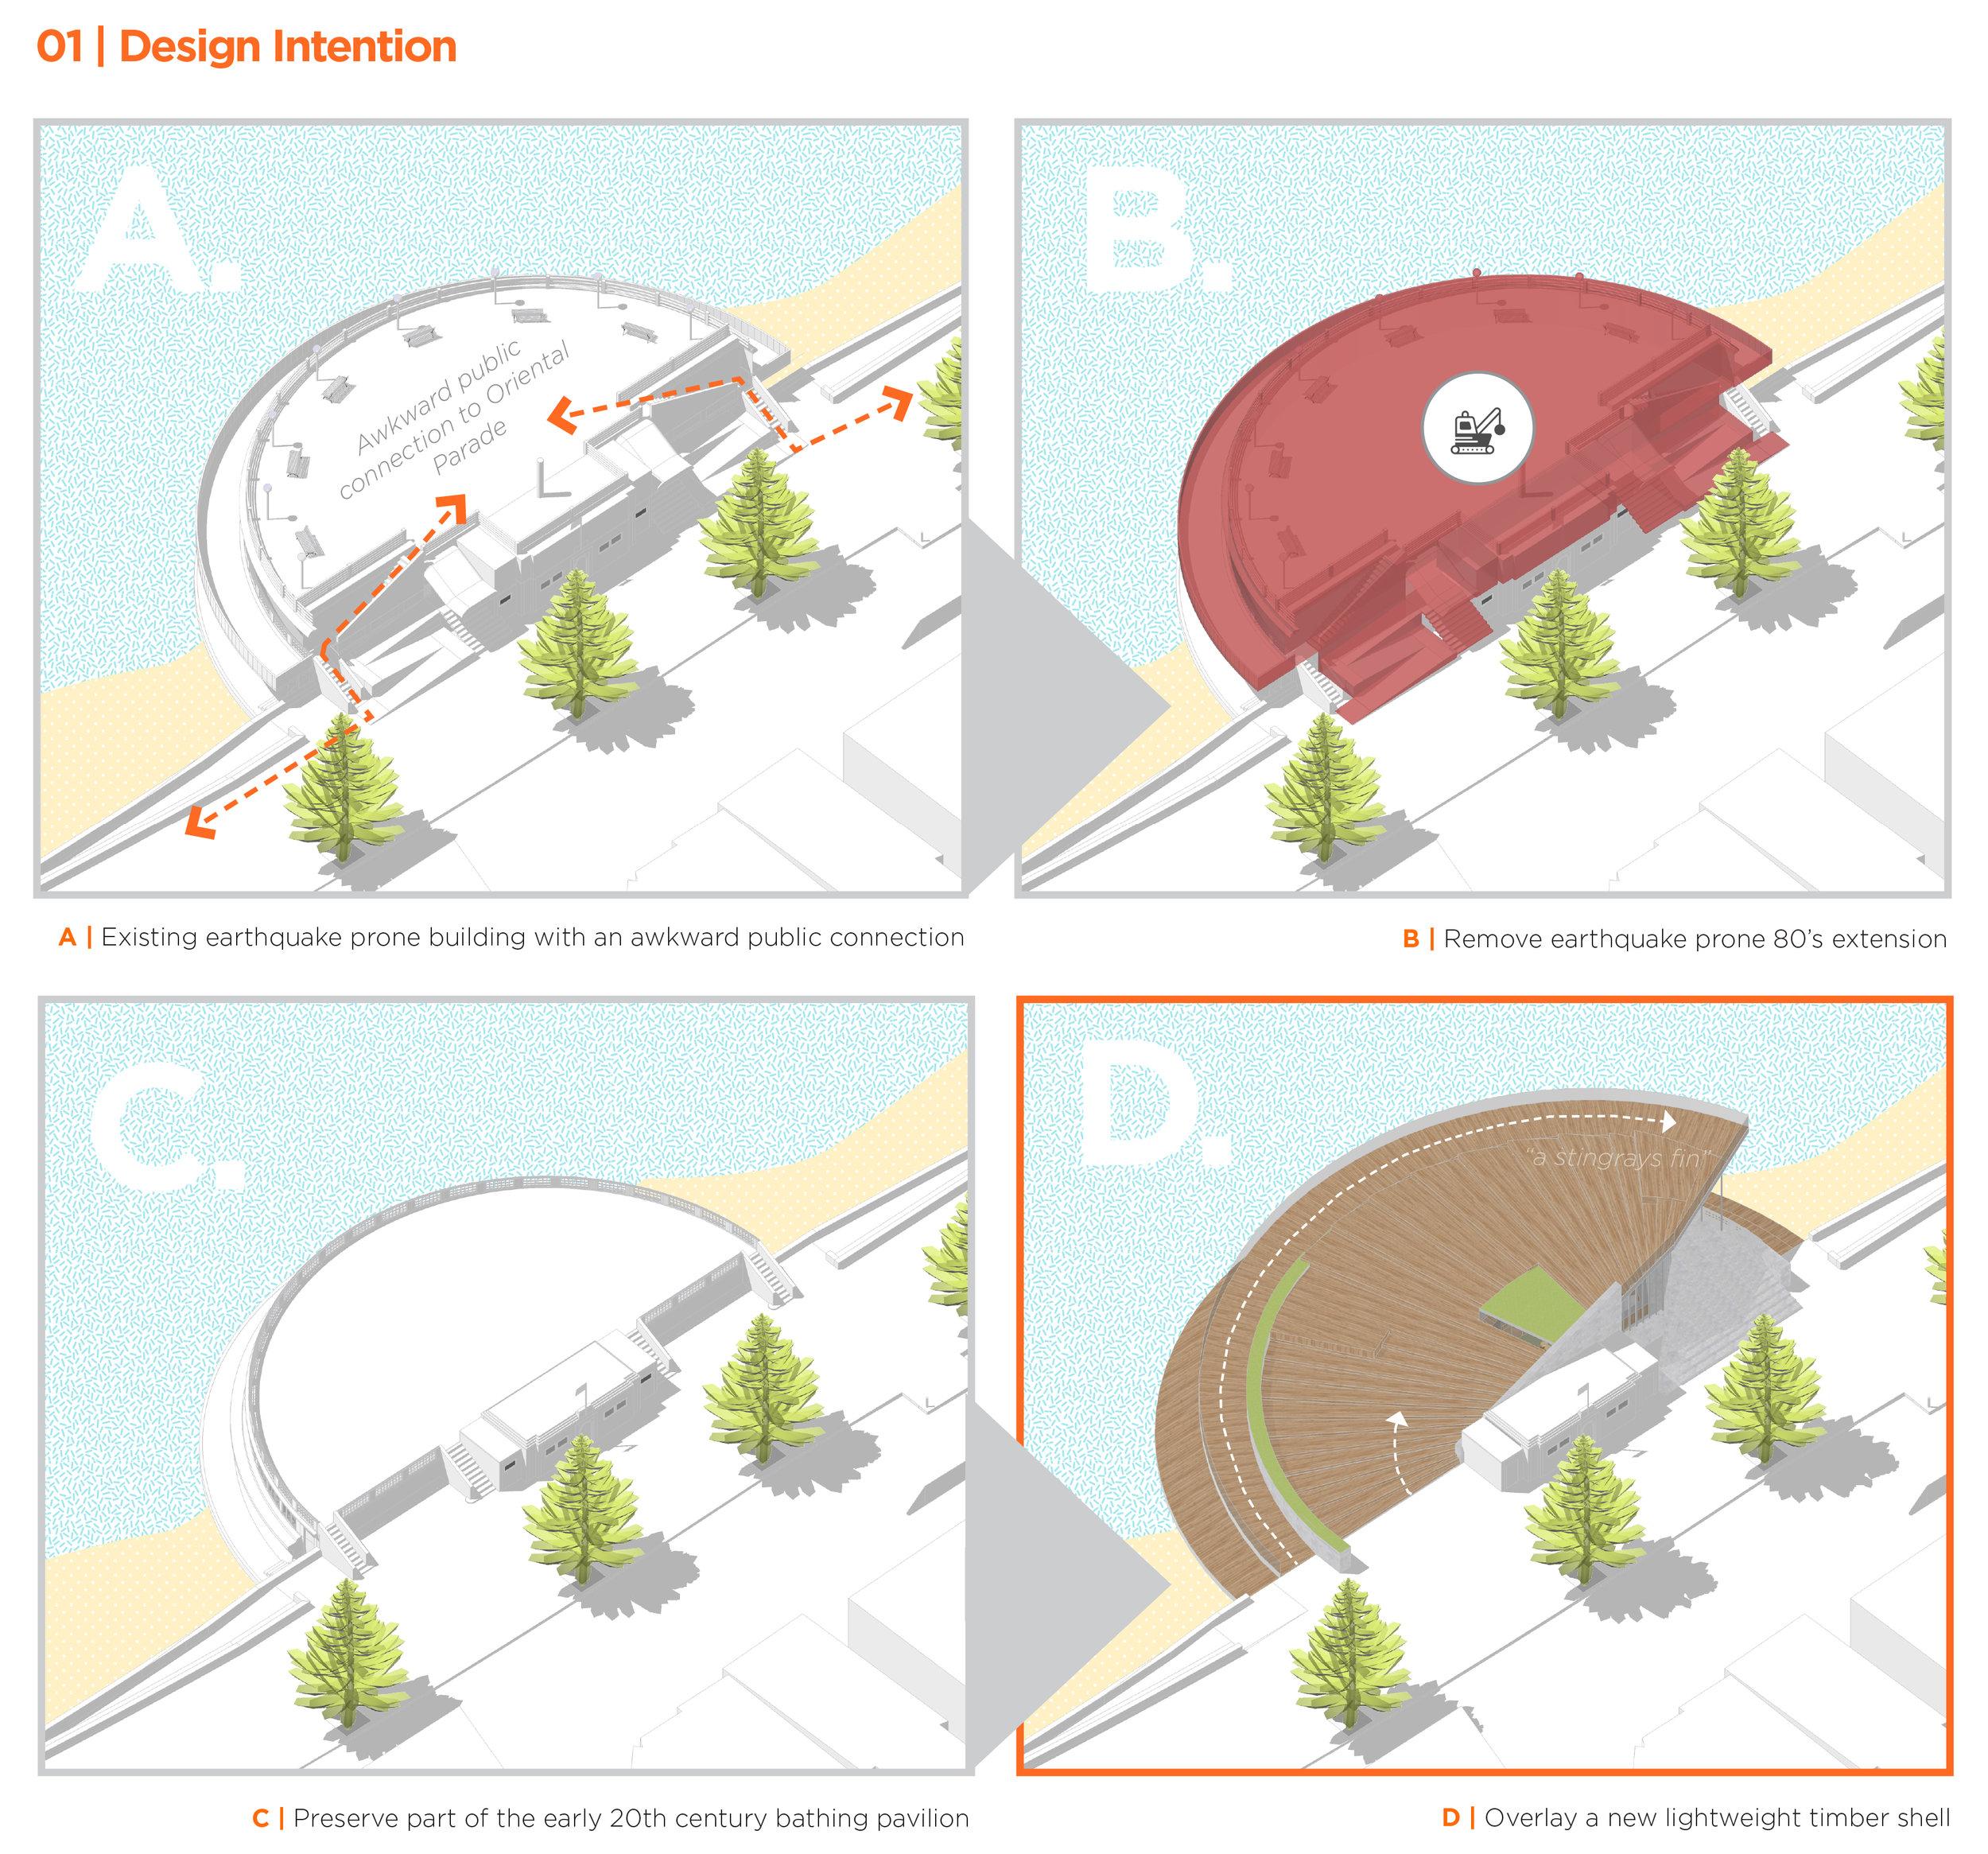 AC2018_444 - Design Intention Diagram.jpg